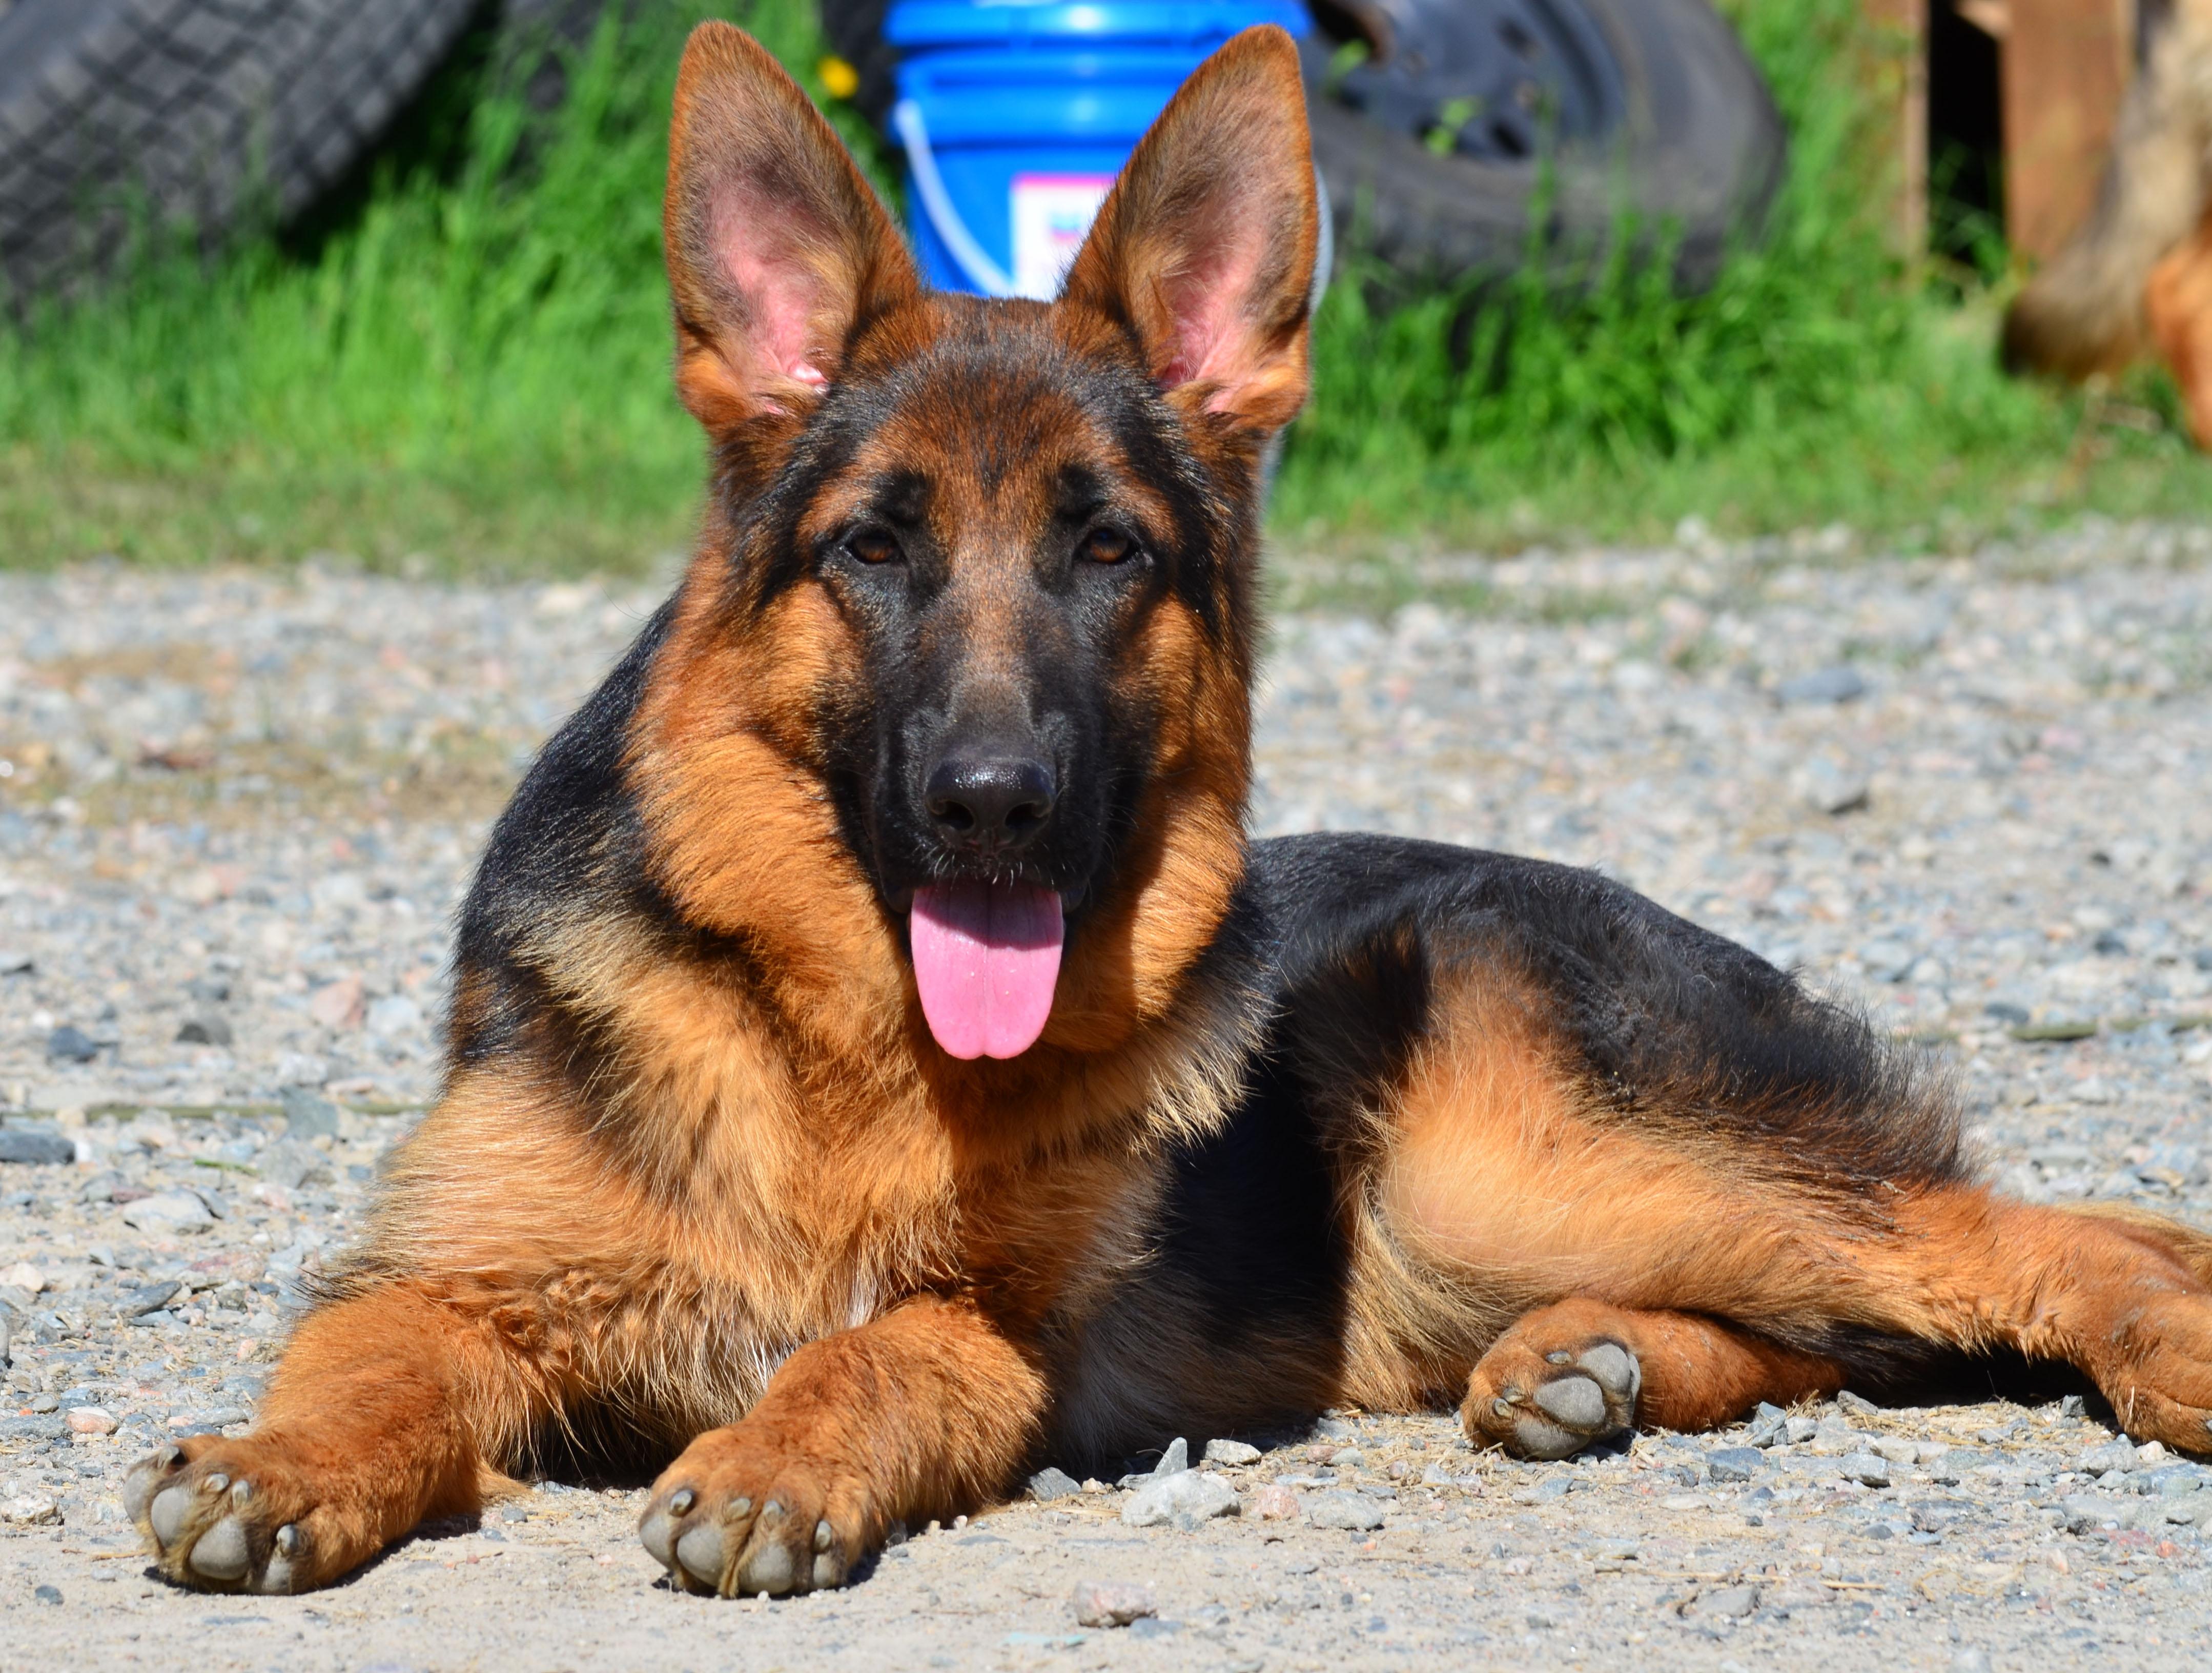 Gala as a puppy